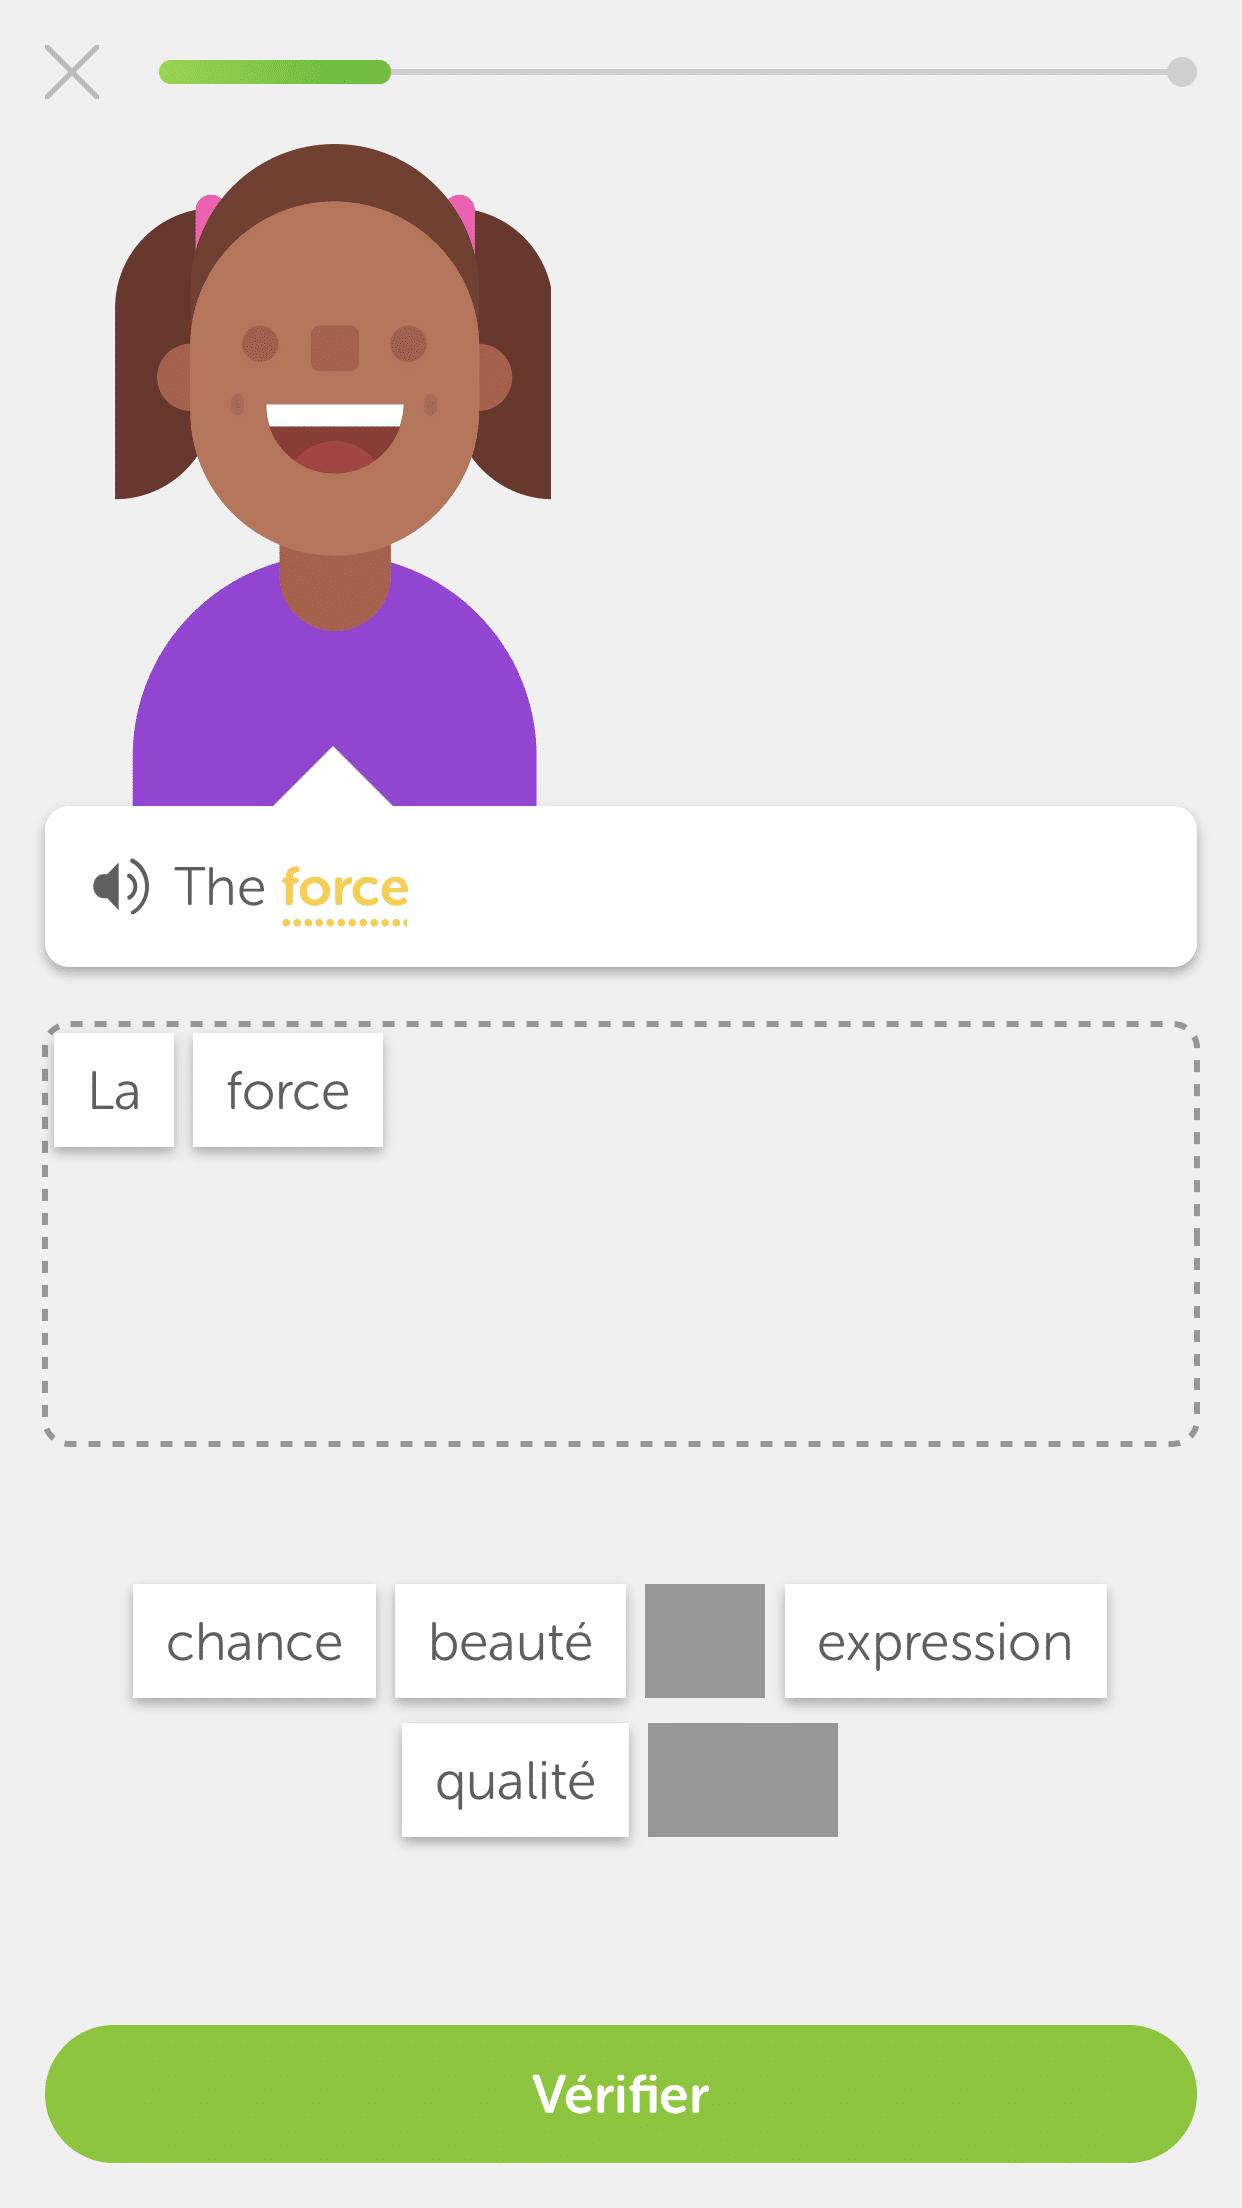 Duolingo-The-Force